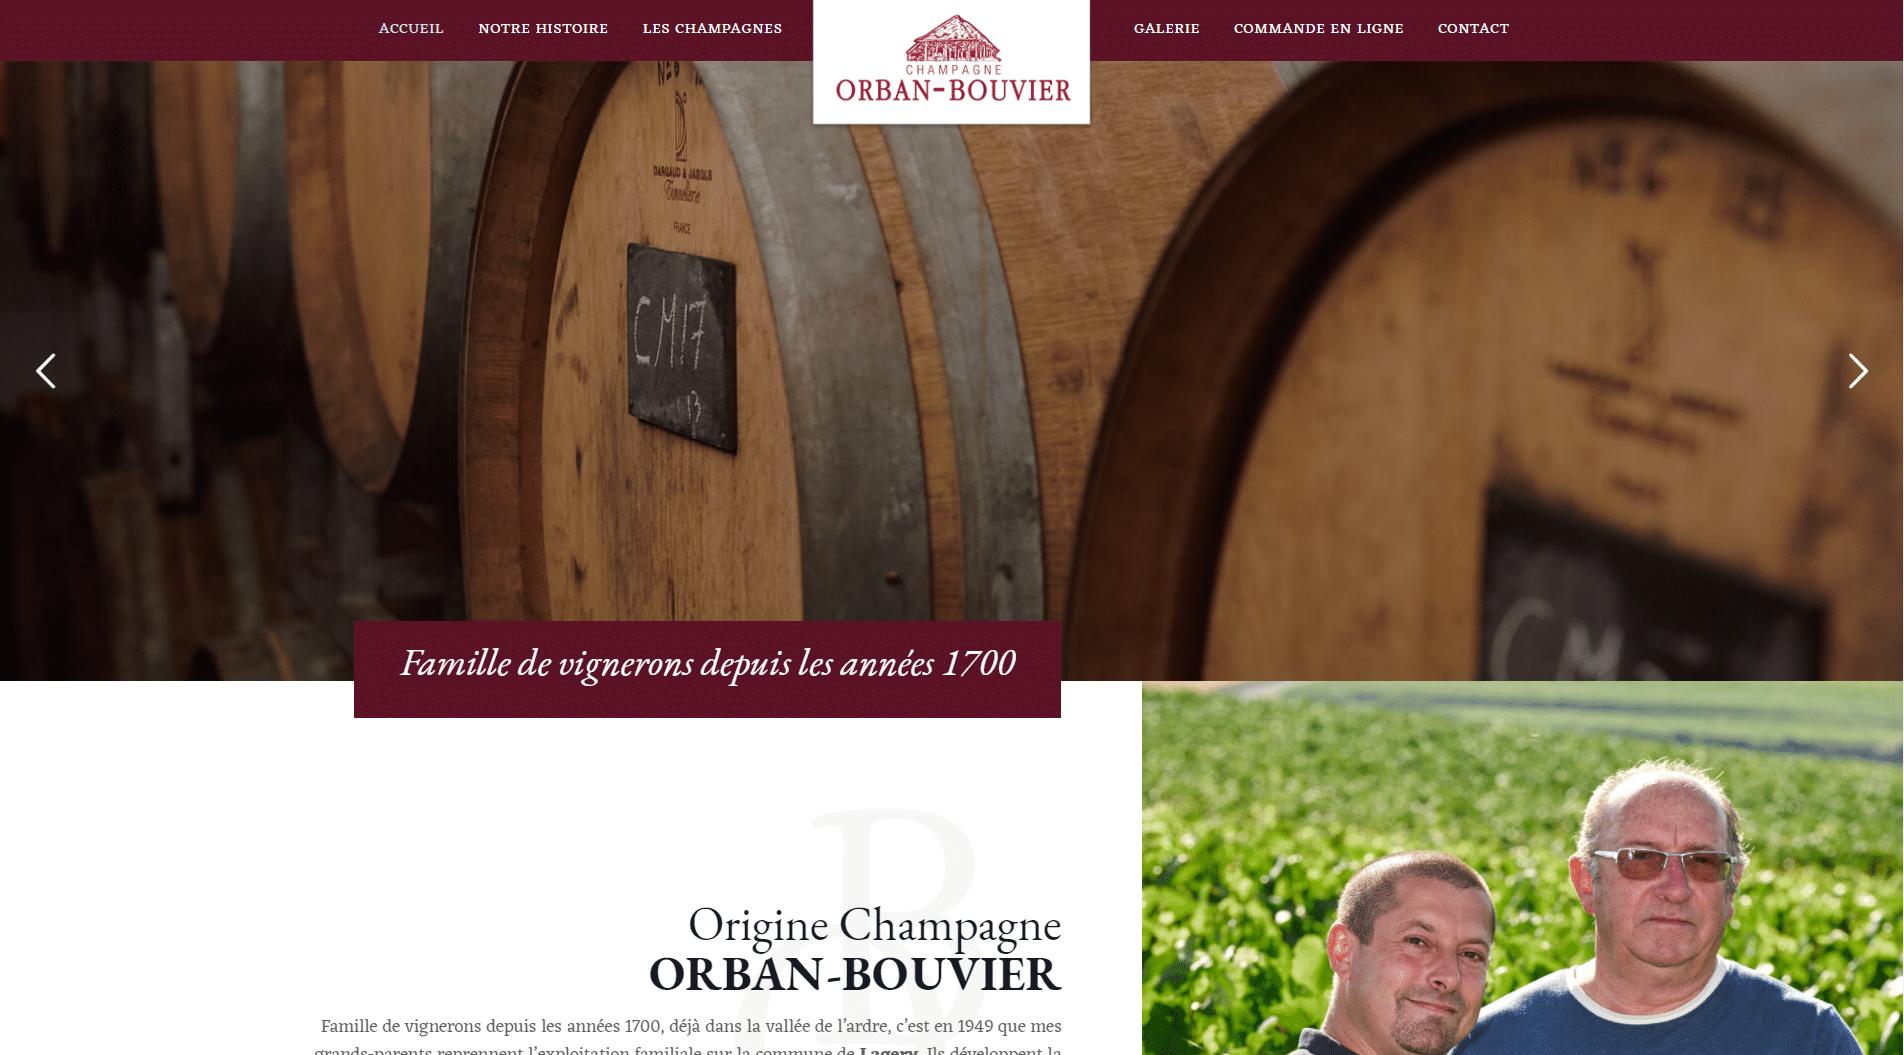 Site Internet Champagne ORBAN BOUVIER